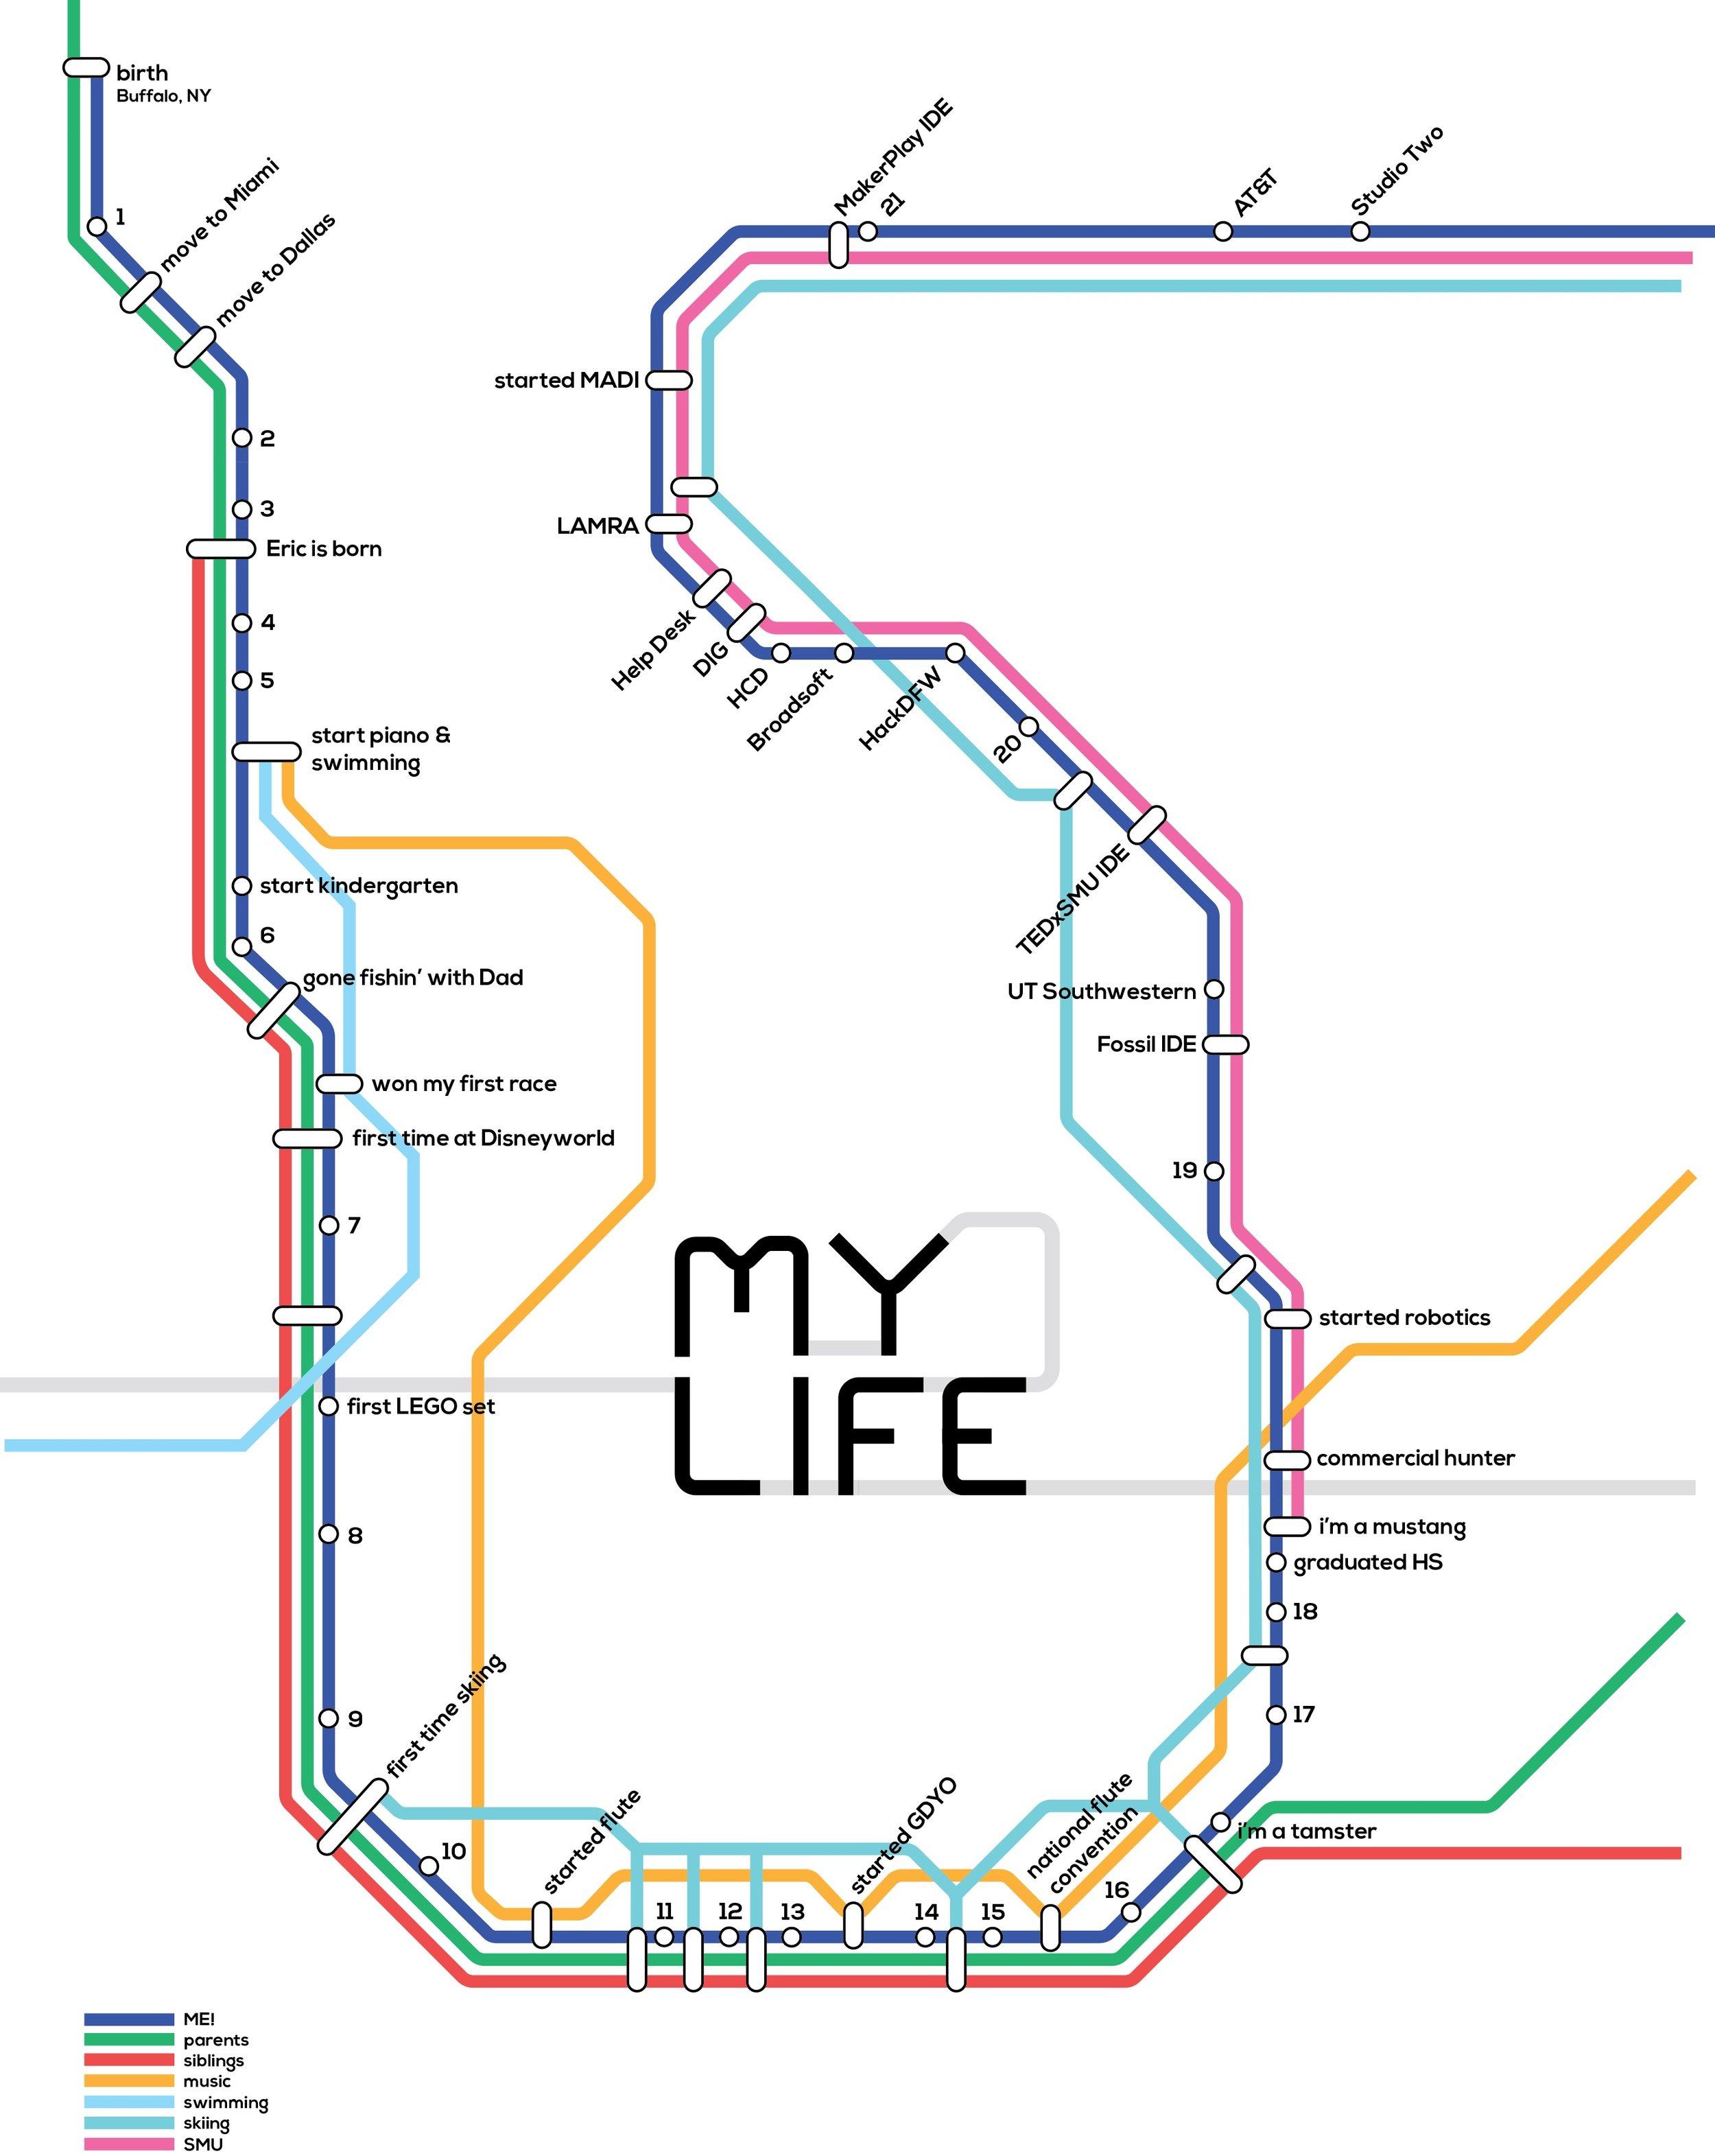 My Life. My Future.